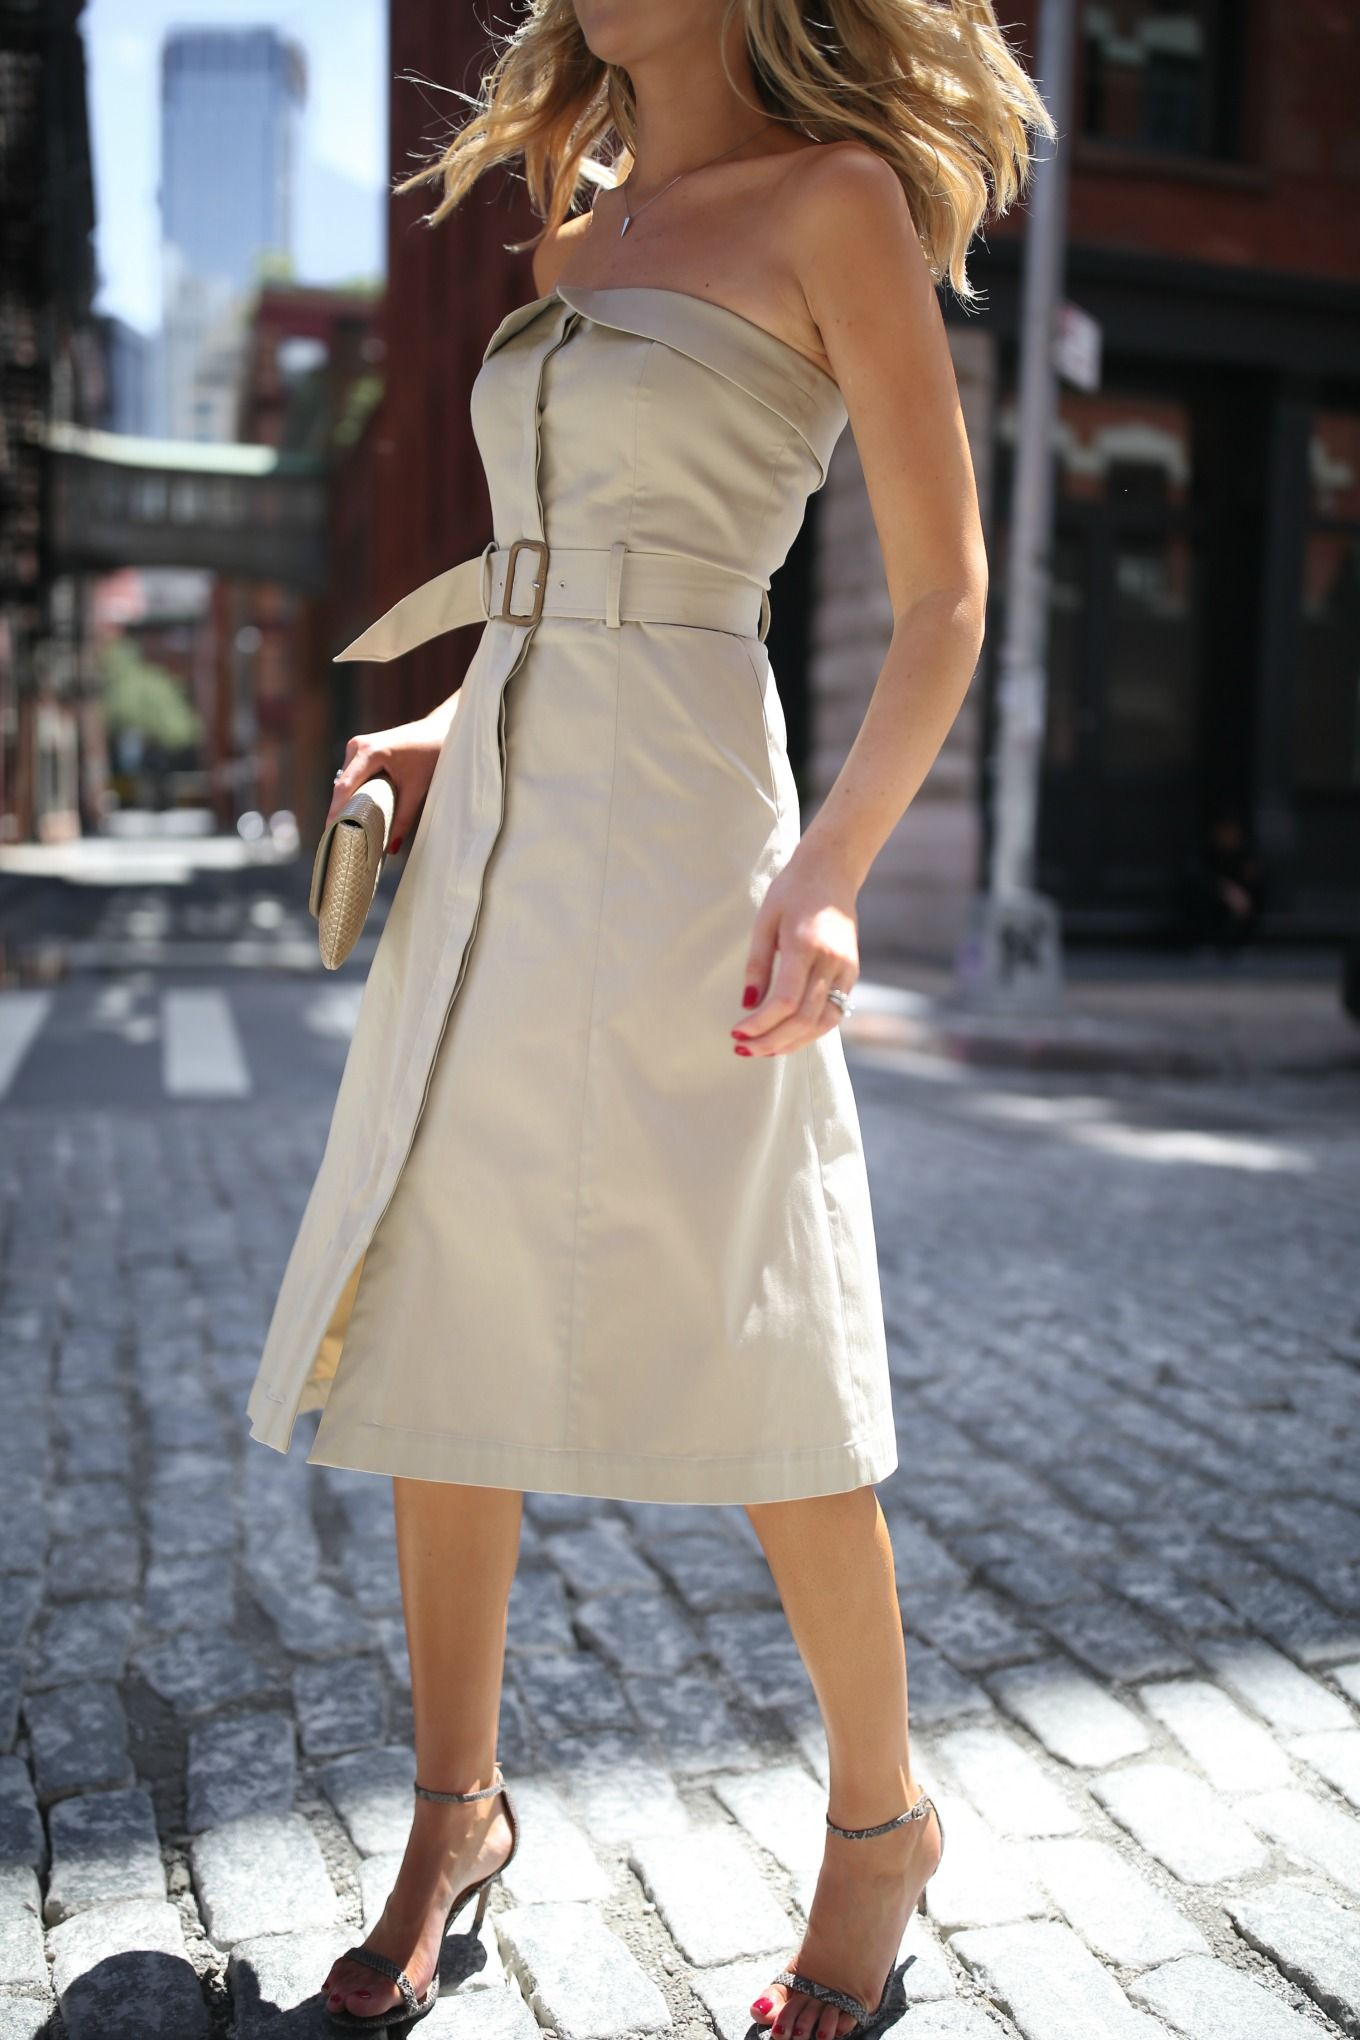 Three Day-To-Night Dresses With Banana Republic   MEMORANDUM   NYC Fashion & Lifestyle Blog for the Working Girl